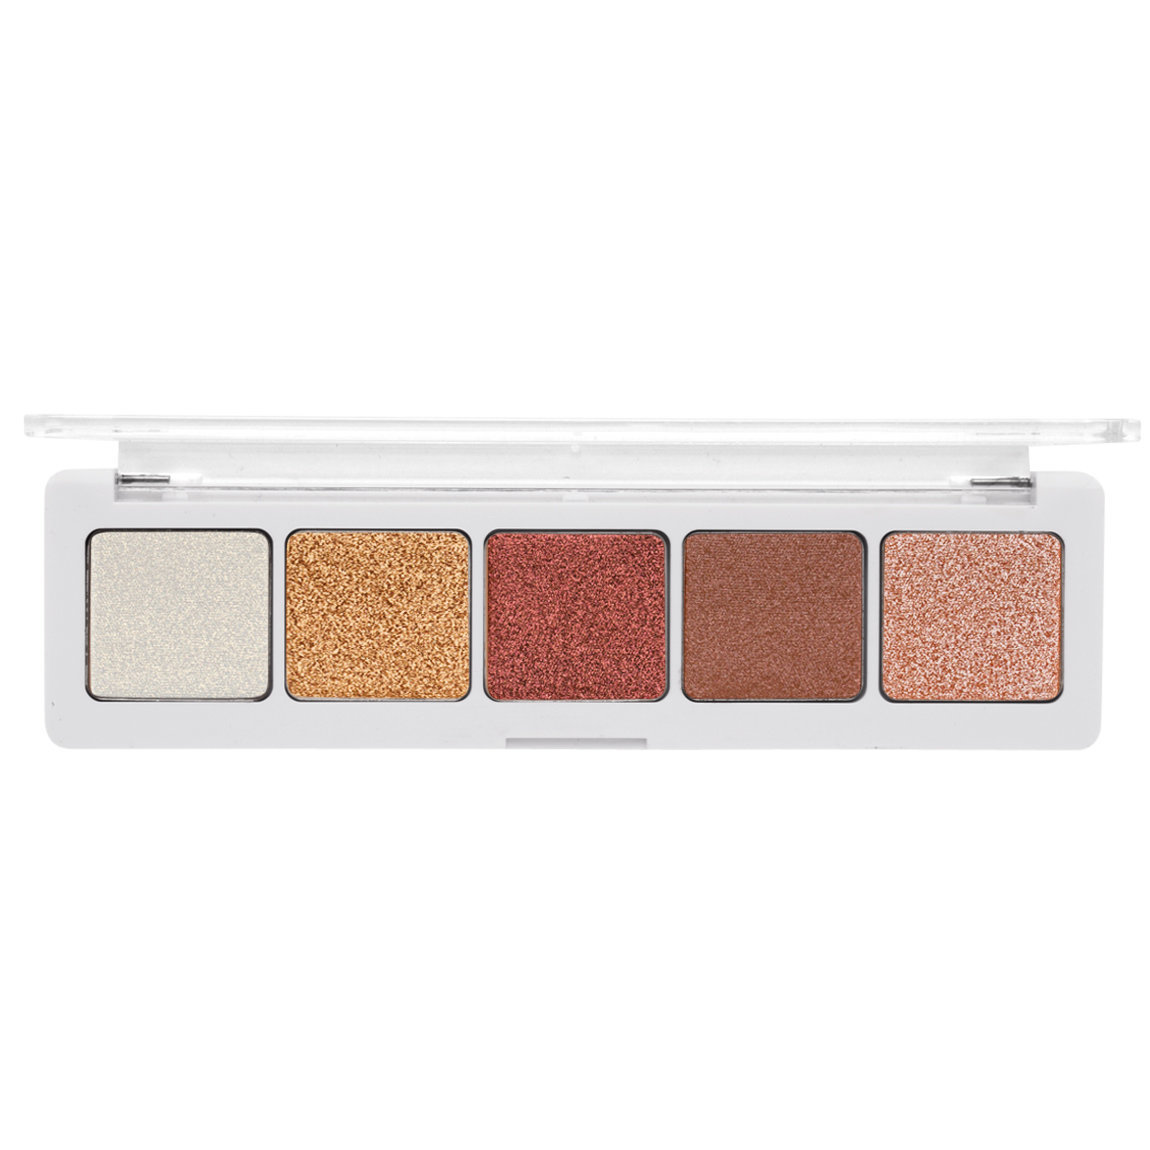 Natasha Denona Eyeshadow Palette 5 Palette 04 product swatch.